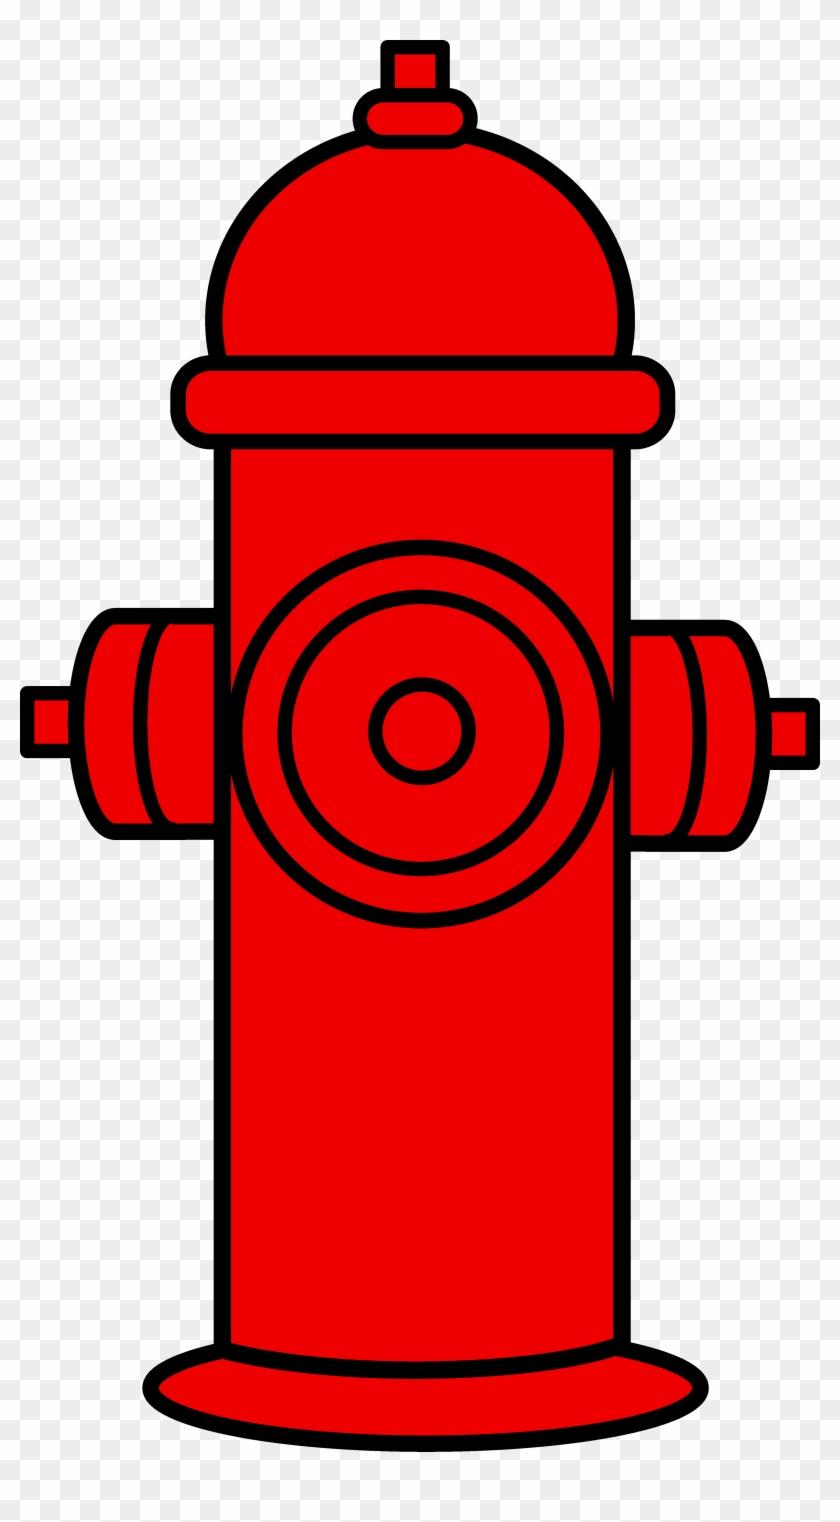 medium resolution of fire truck clipart fire hydrant paw patrol fire hydrant